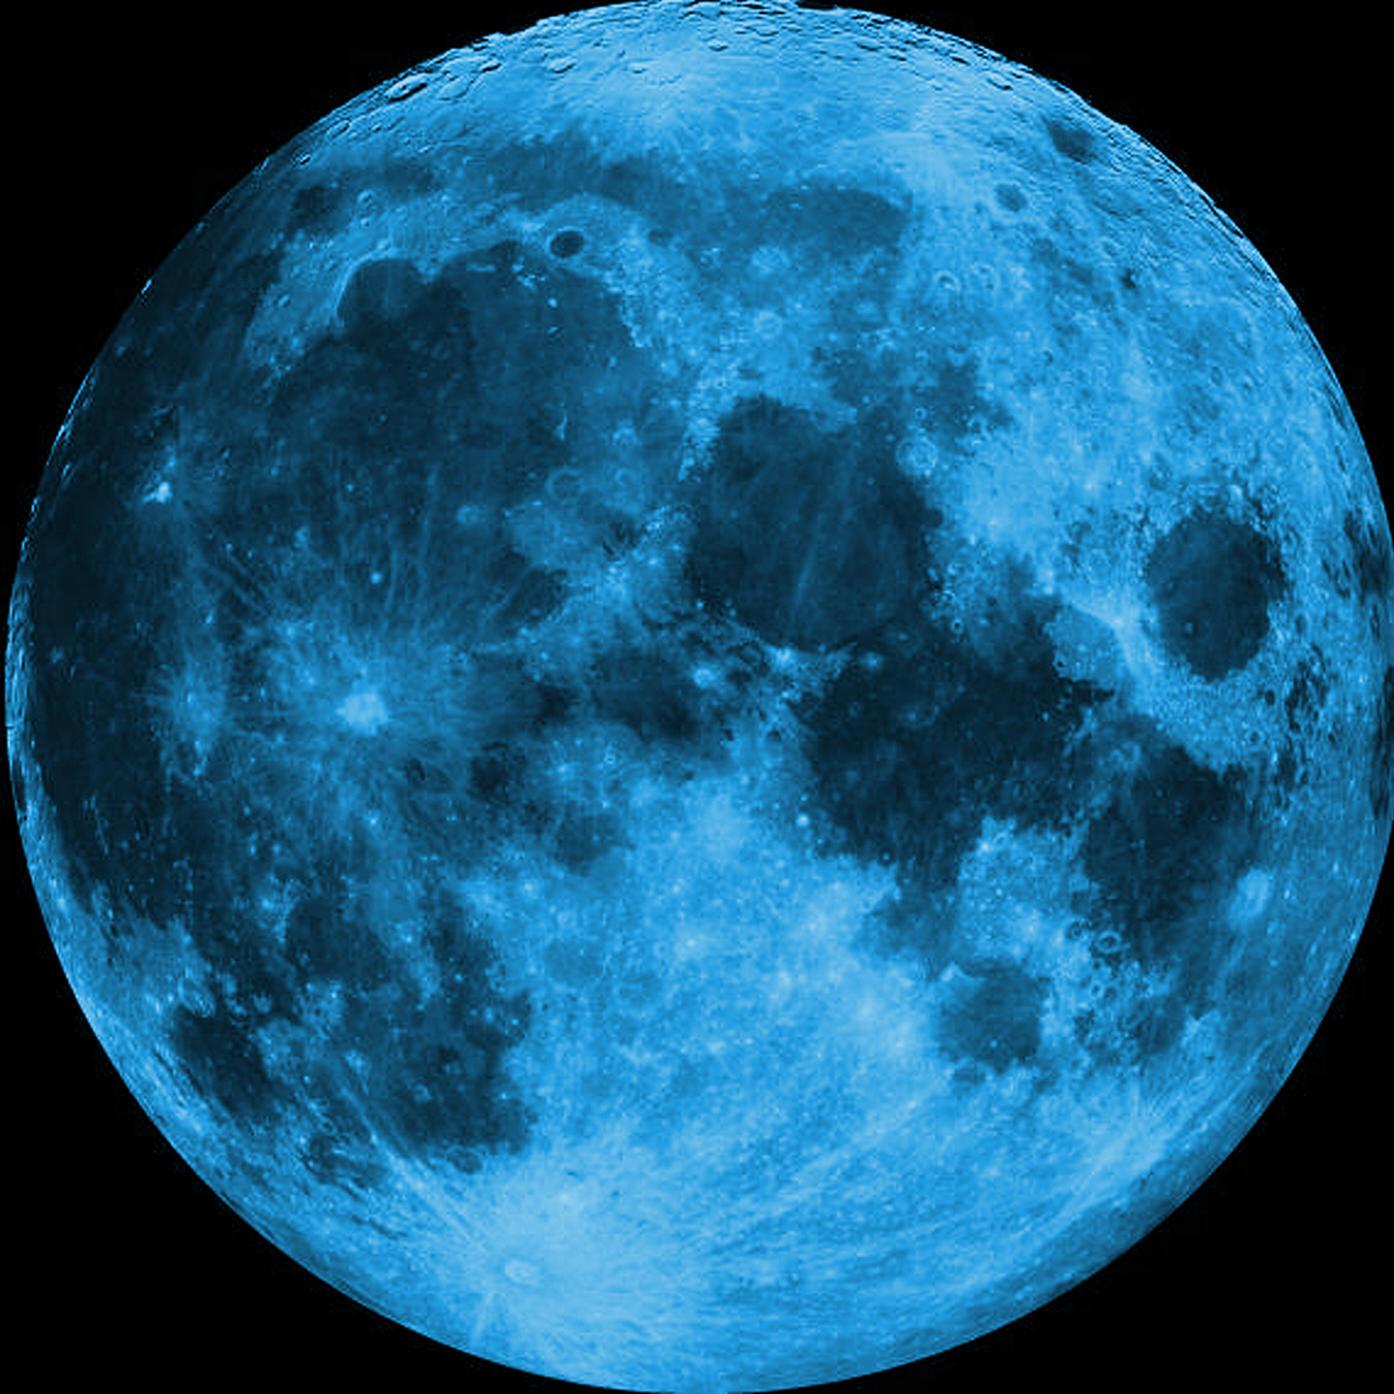 nasa night sky mezza luna - photo #46